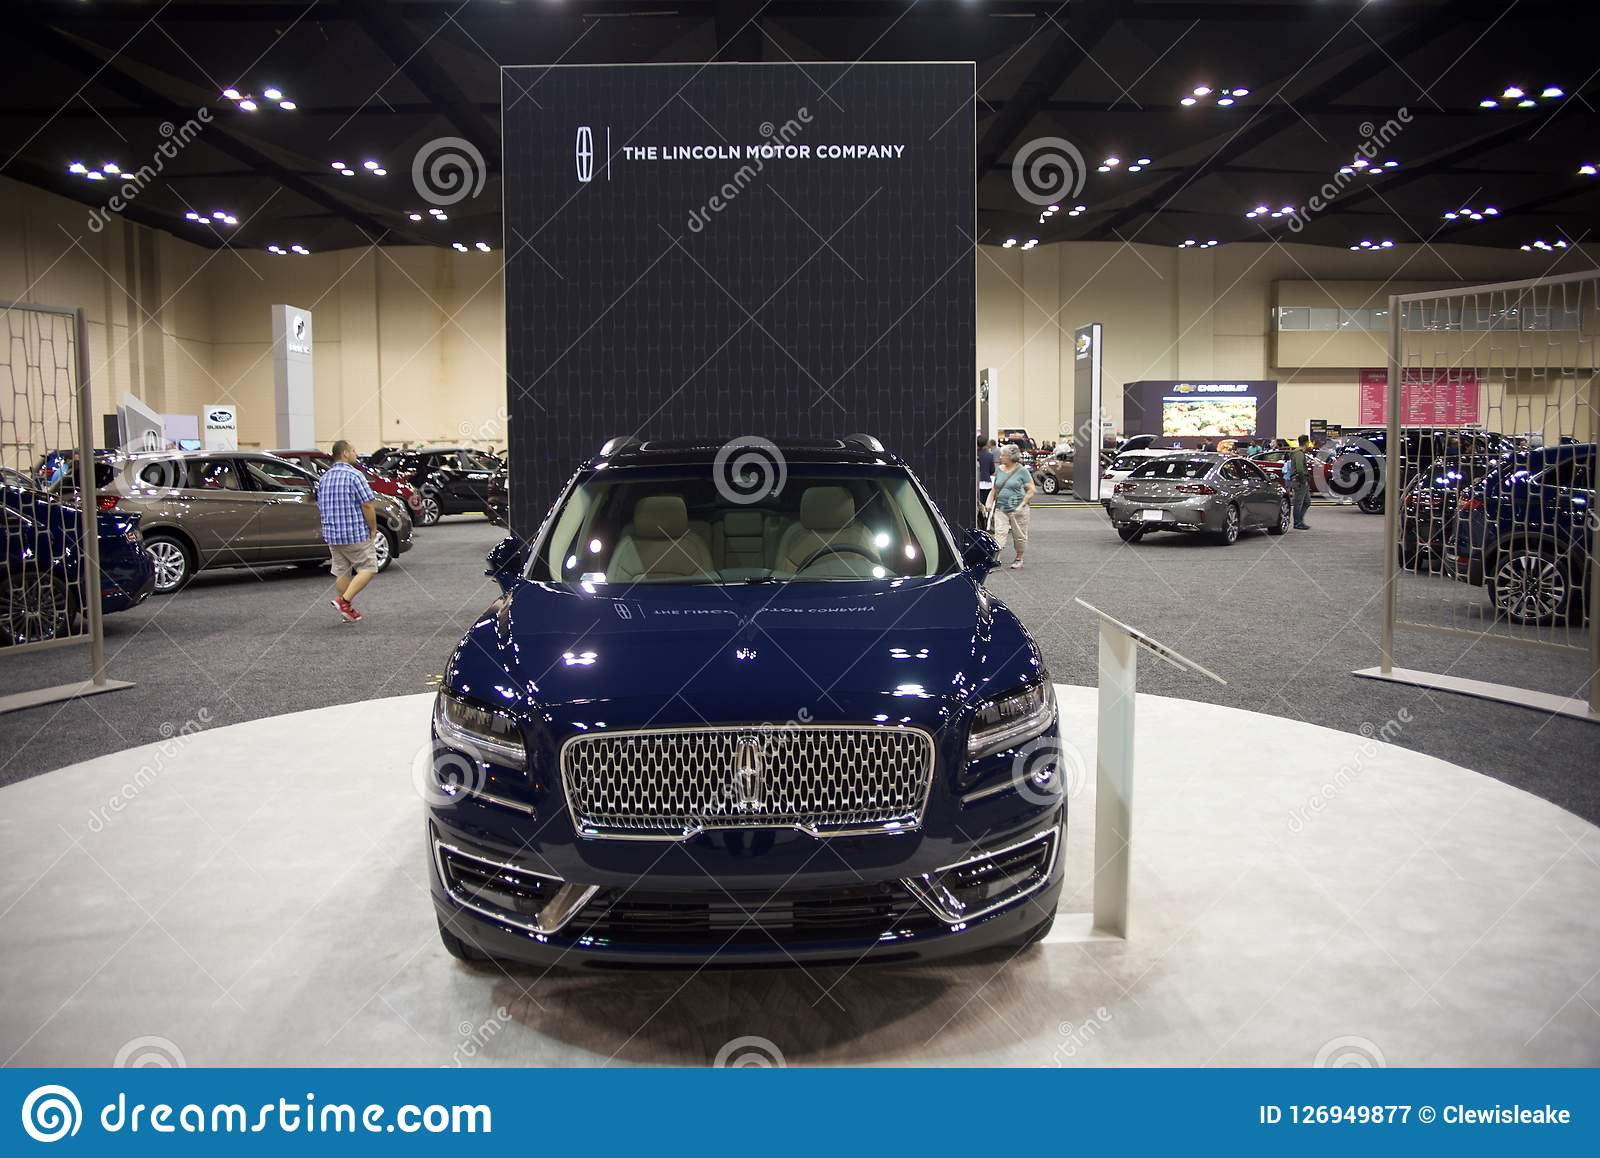 Lincoln Motor Company >> Lincoln Motor Company Nautilus Automobile Editorial